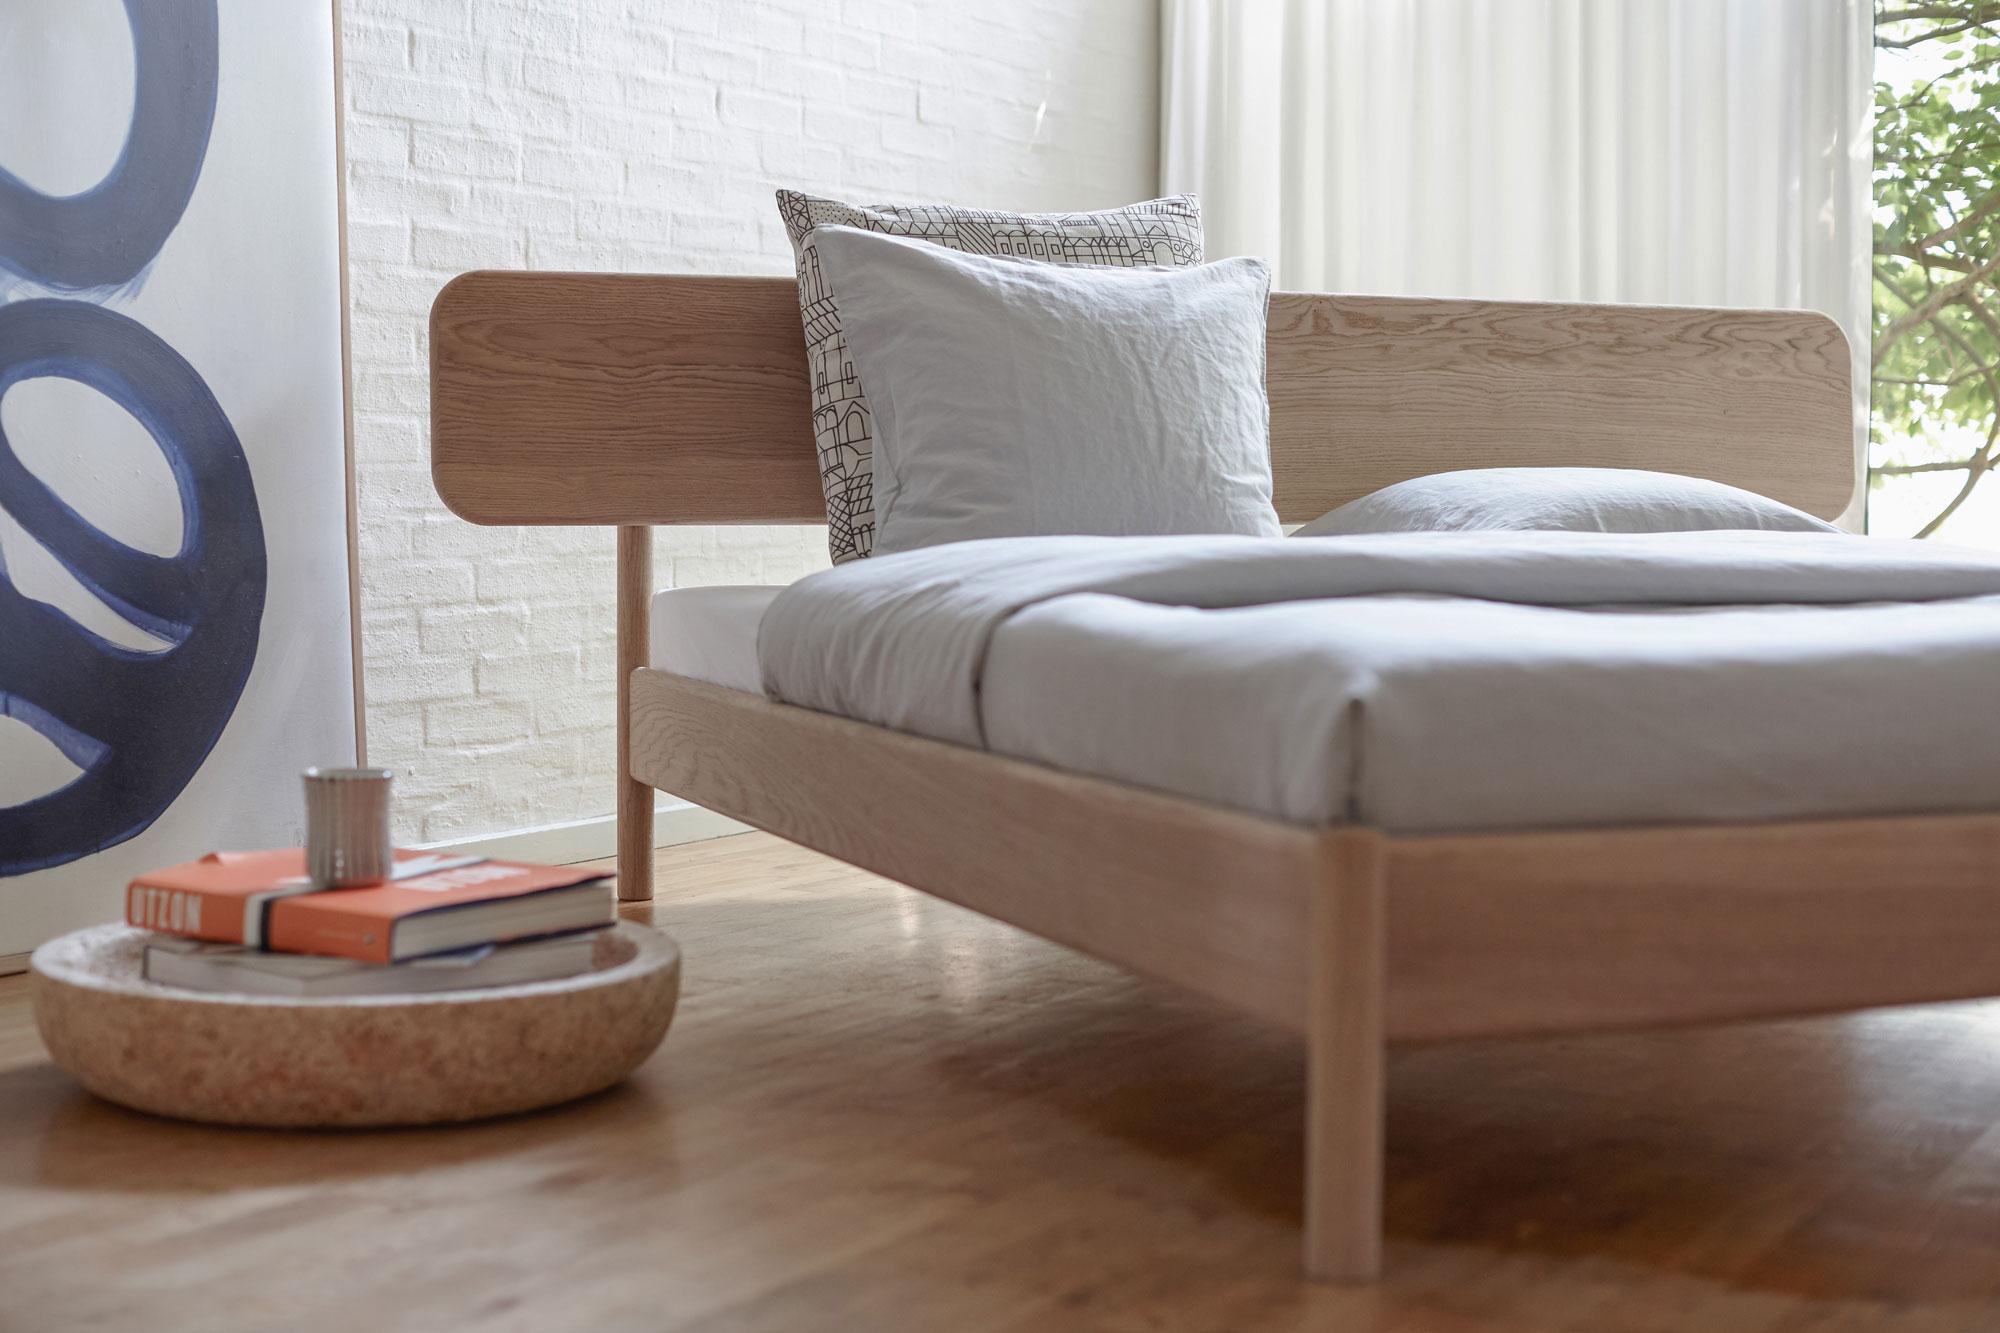 07---ALKEN-BED---RE-BEDS---DESIGN-BY-OLIVER-&-LUKAS-WEISSKROGH.jpg